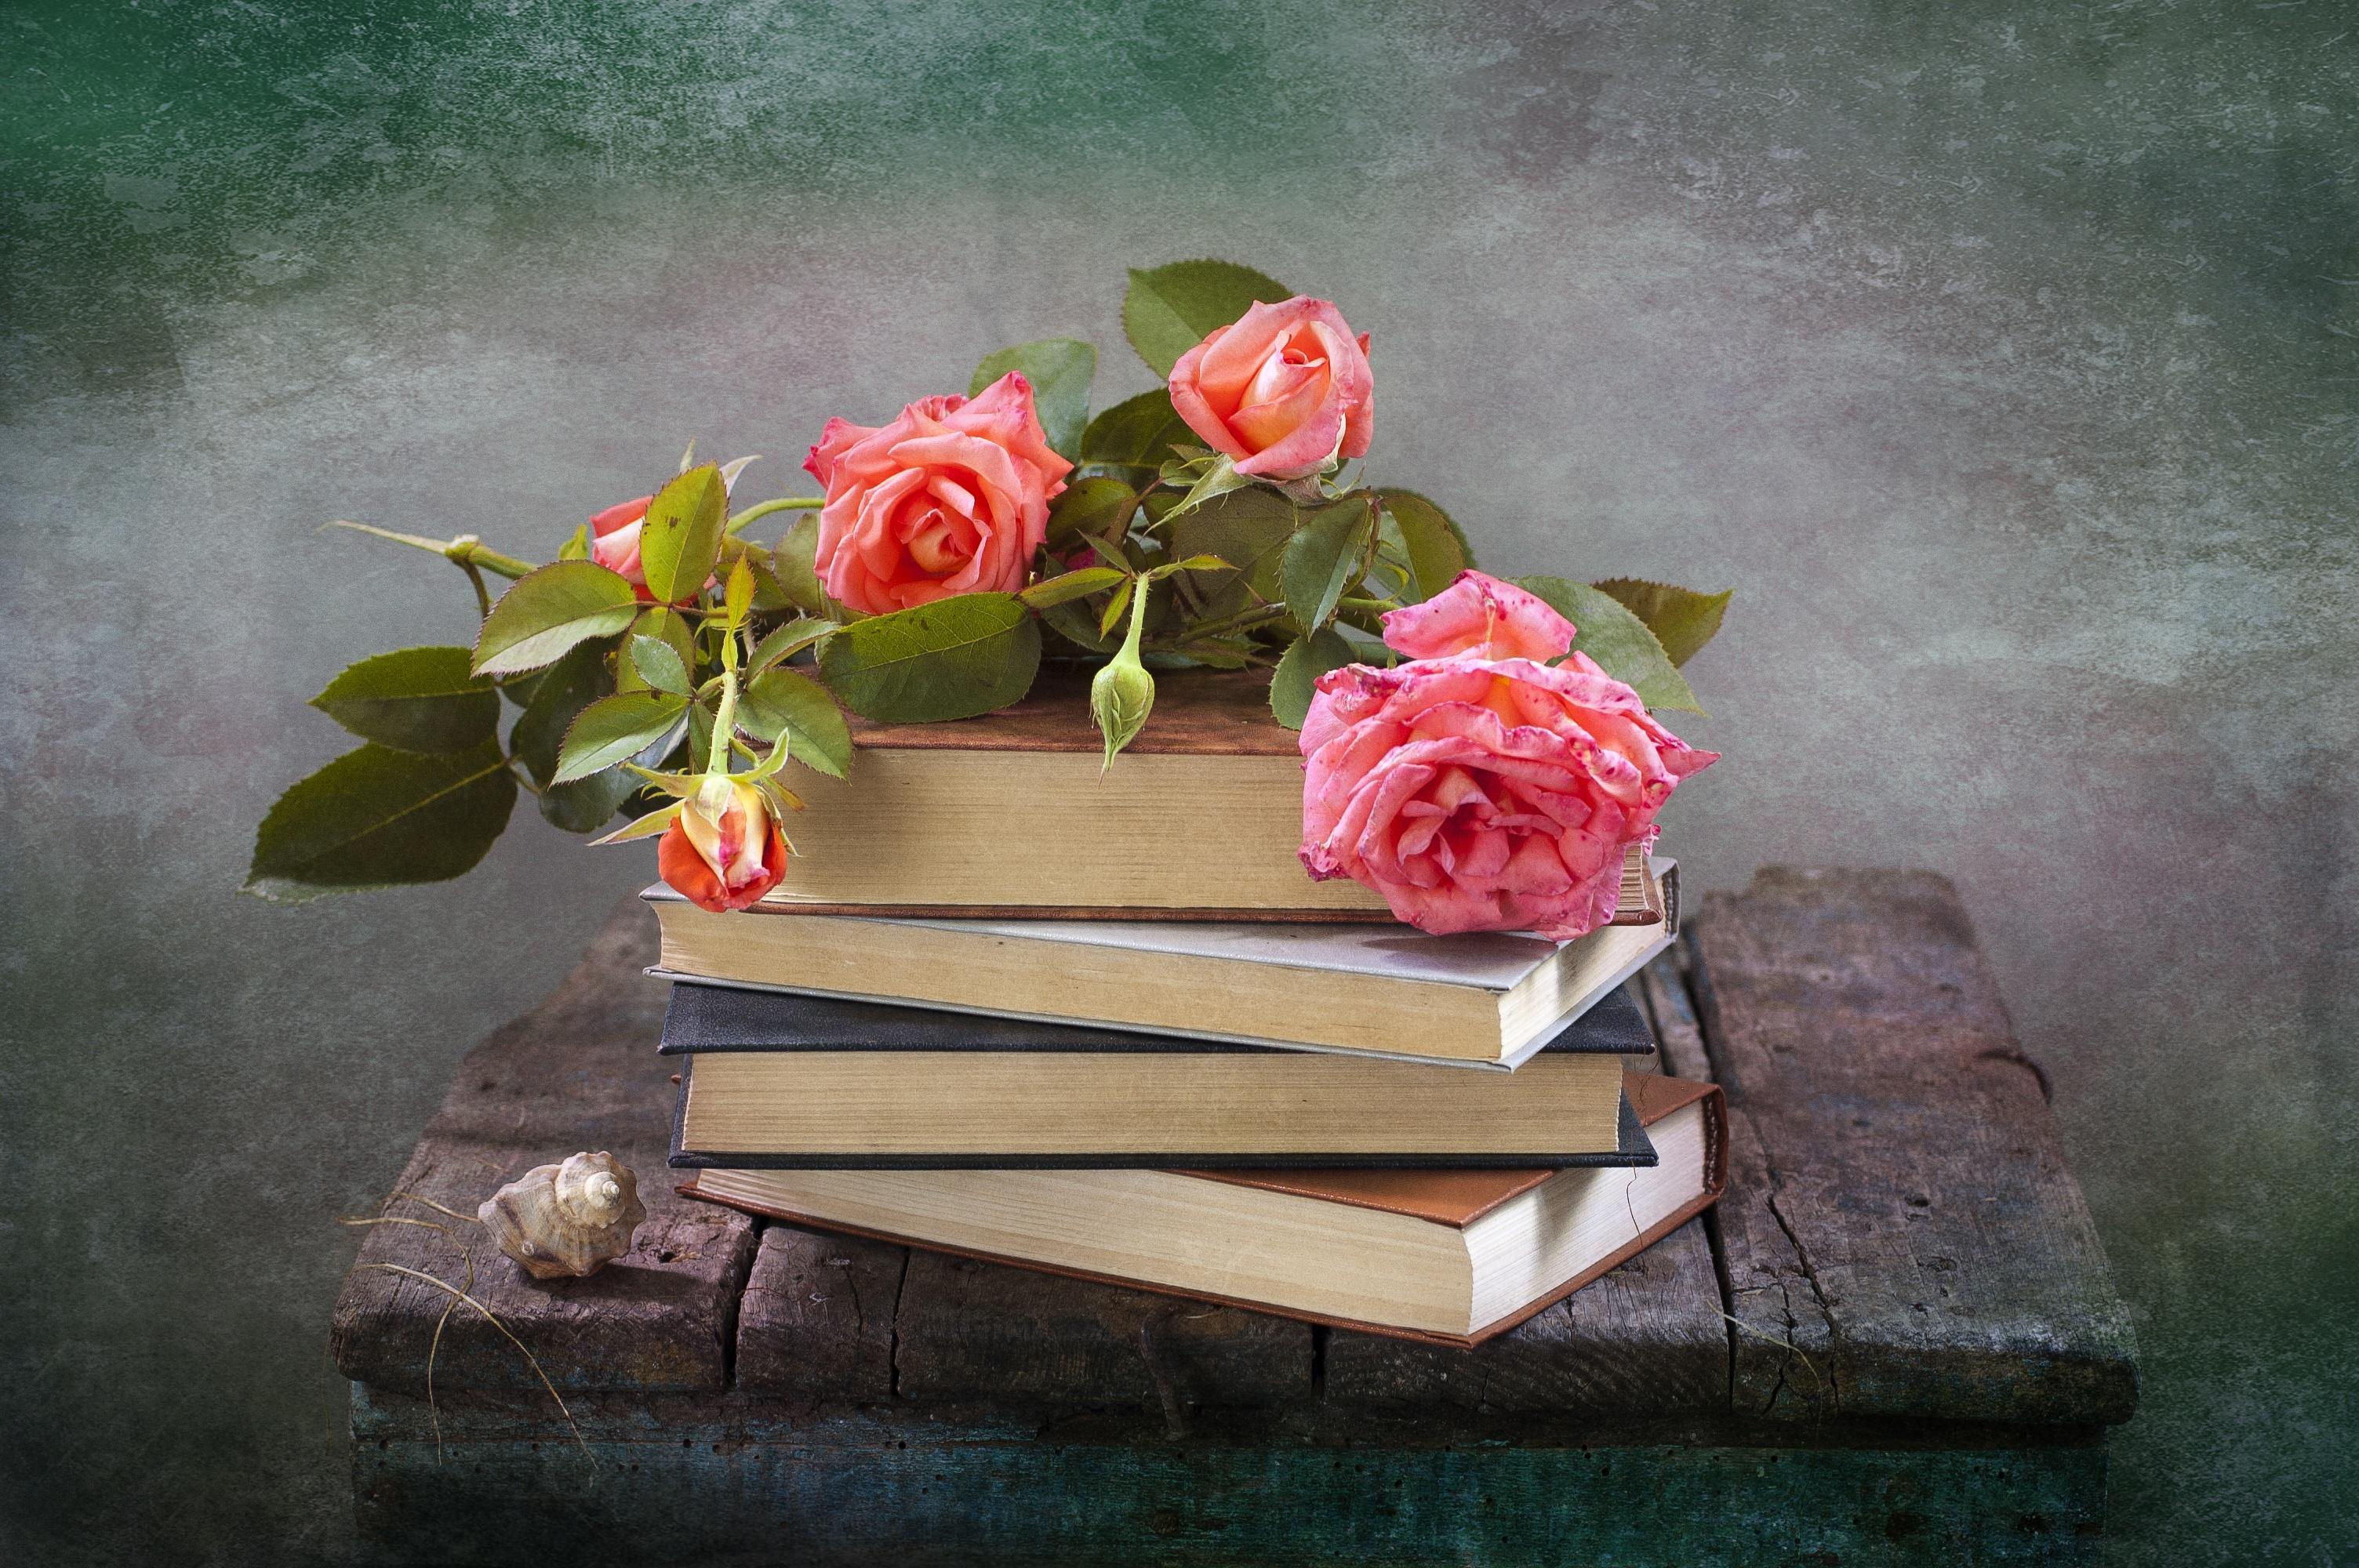 Цветок в книге  № 1489057 бесплатно